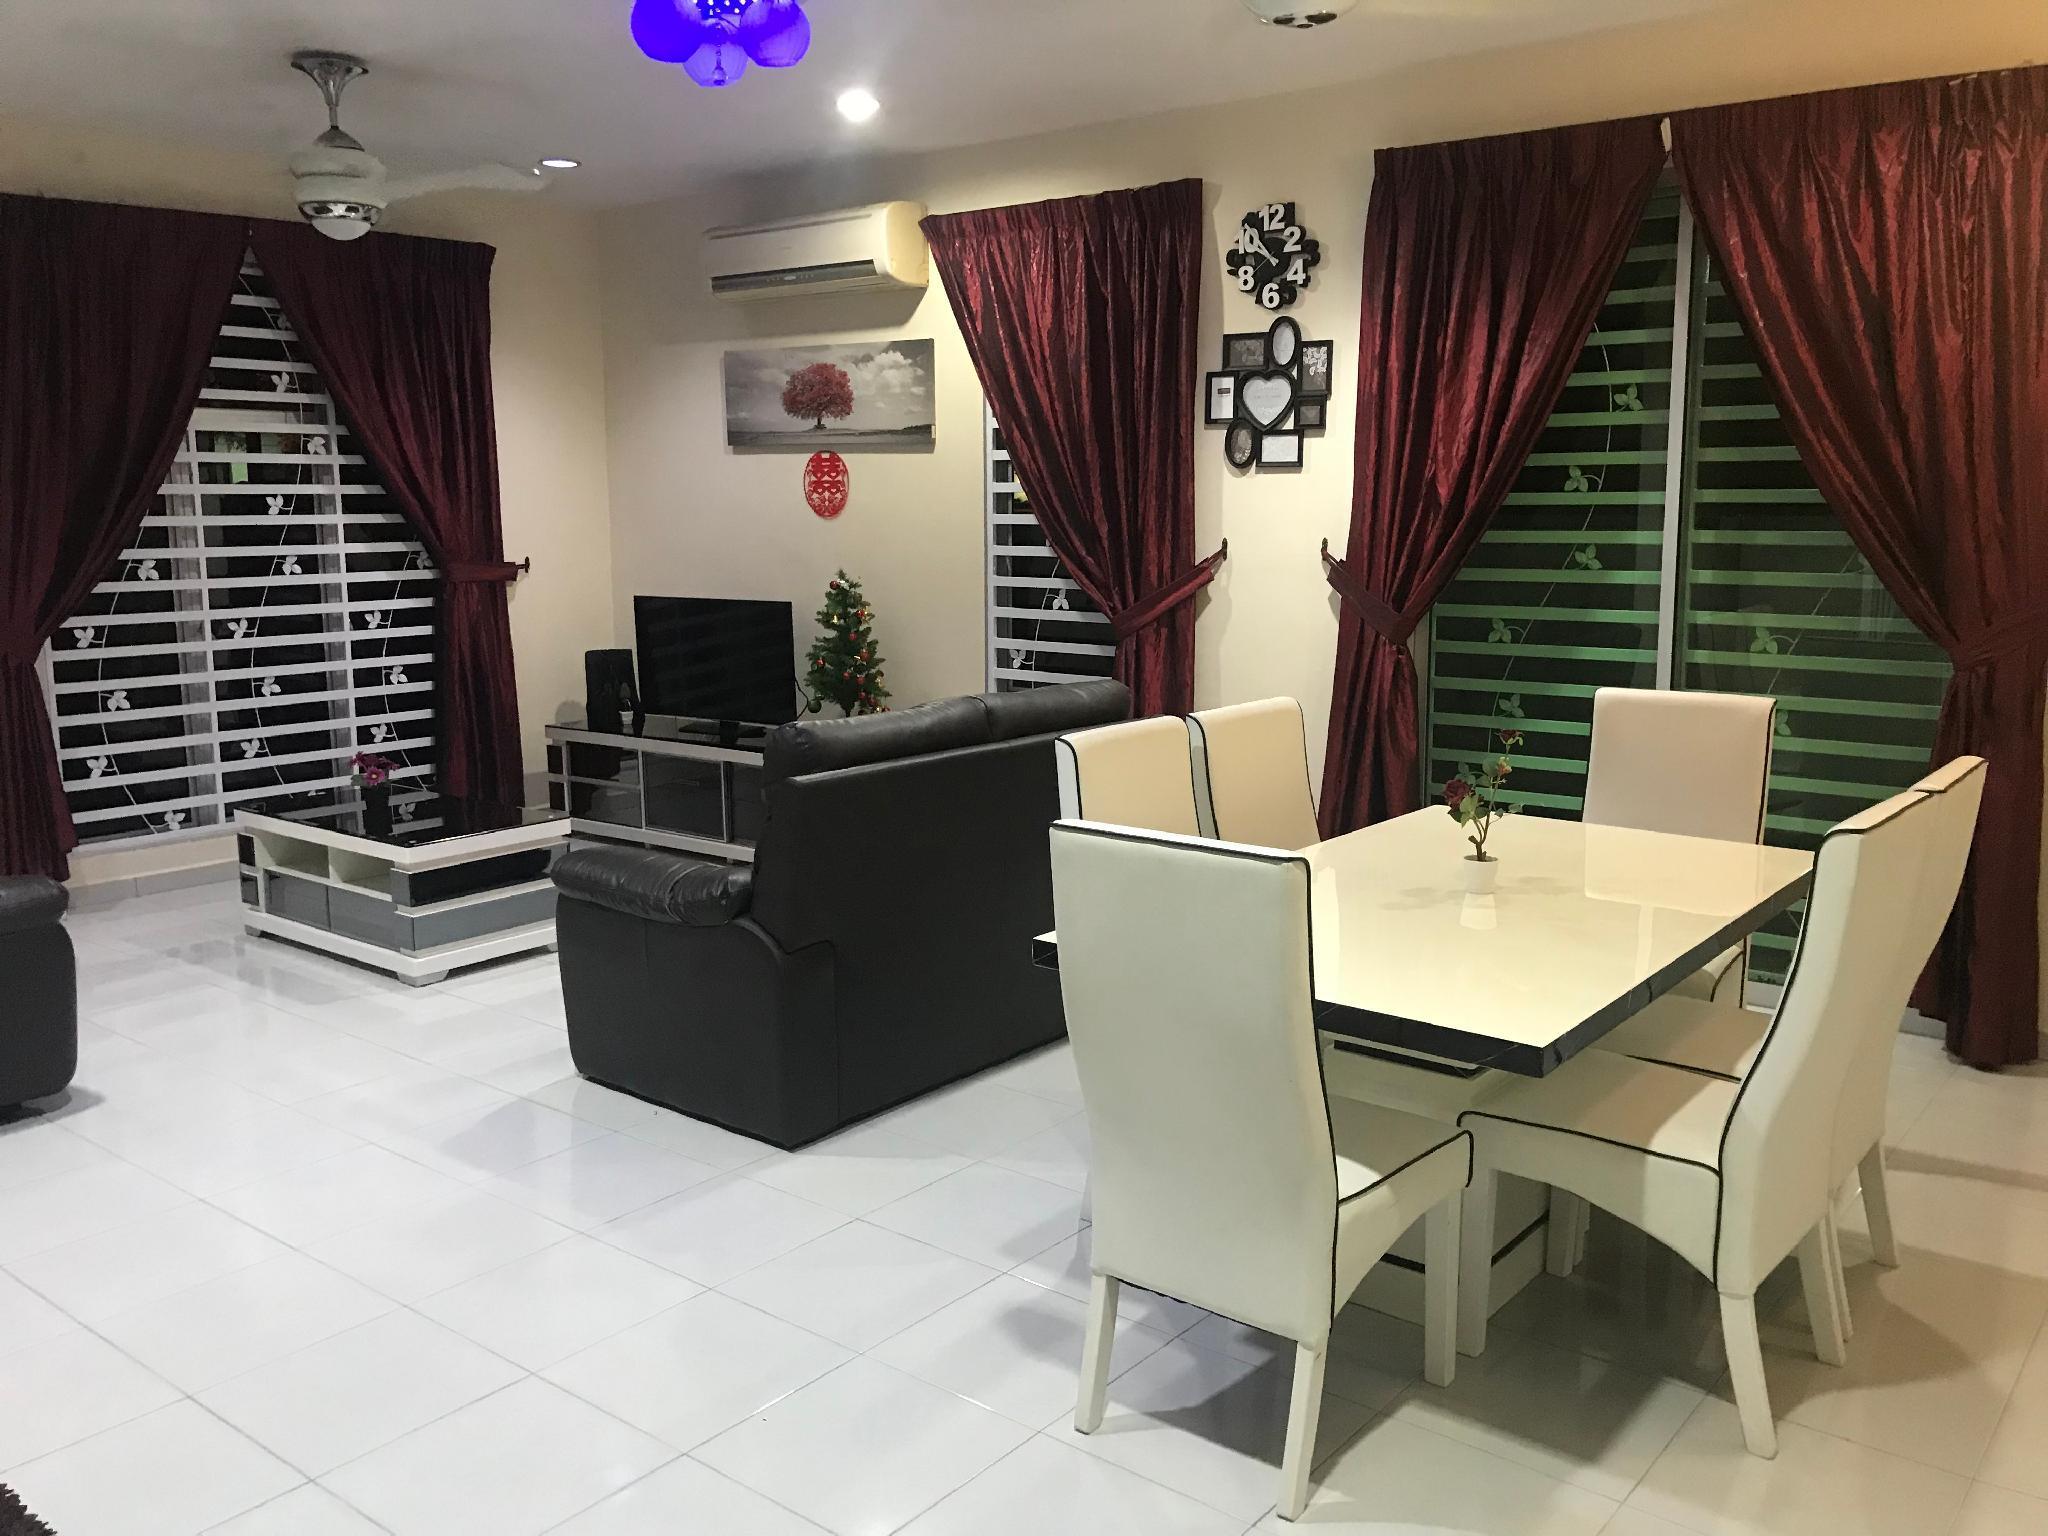 D Resort Homestay 16pax(BBQ, Gym, SWIM POOL, WiFi)